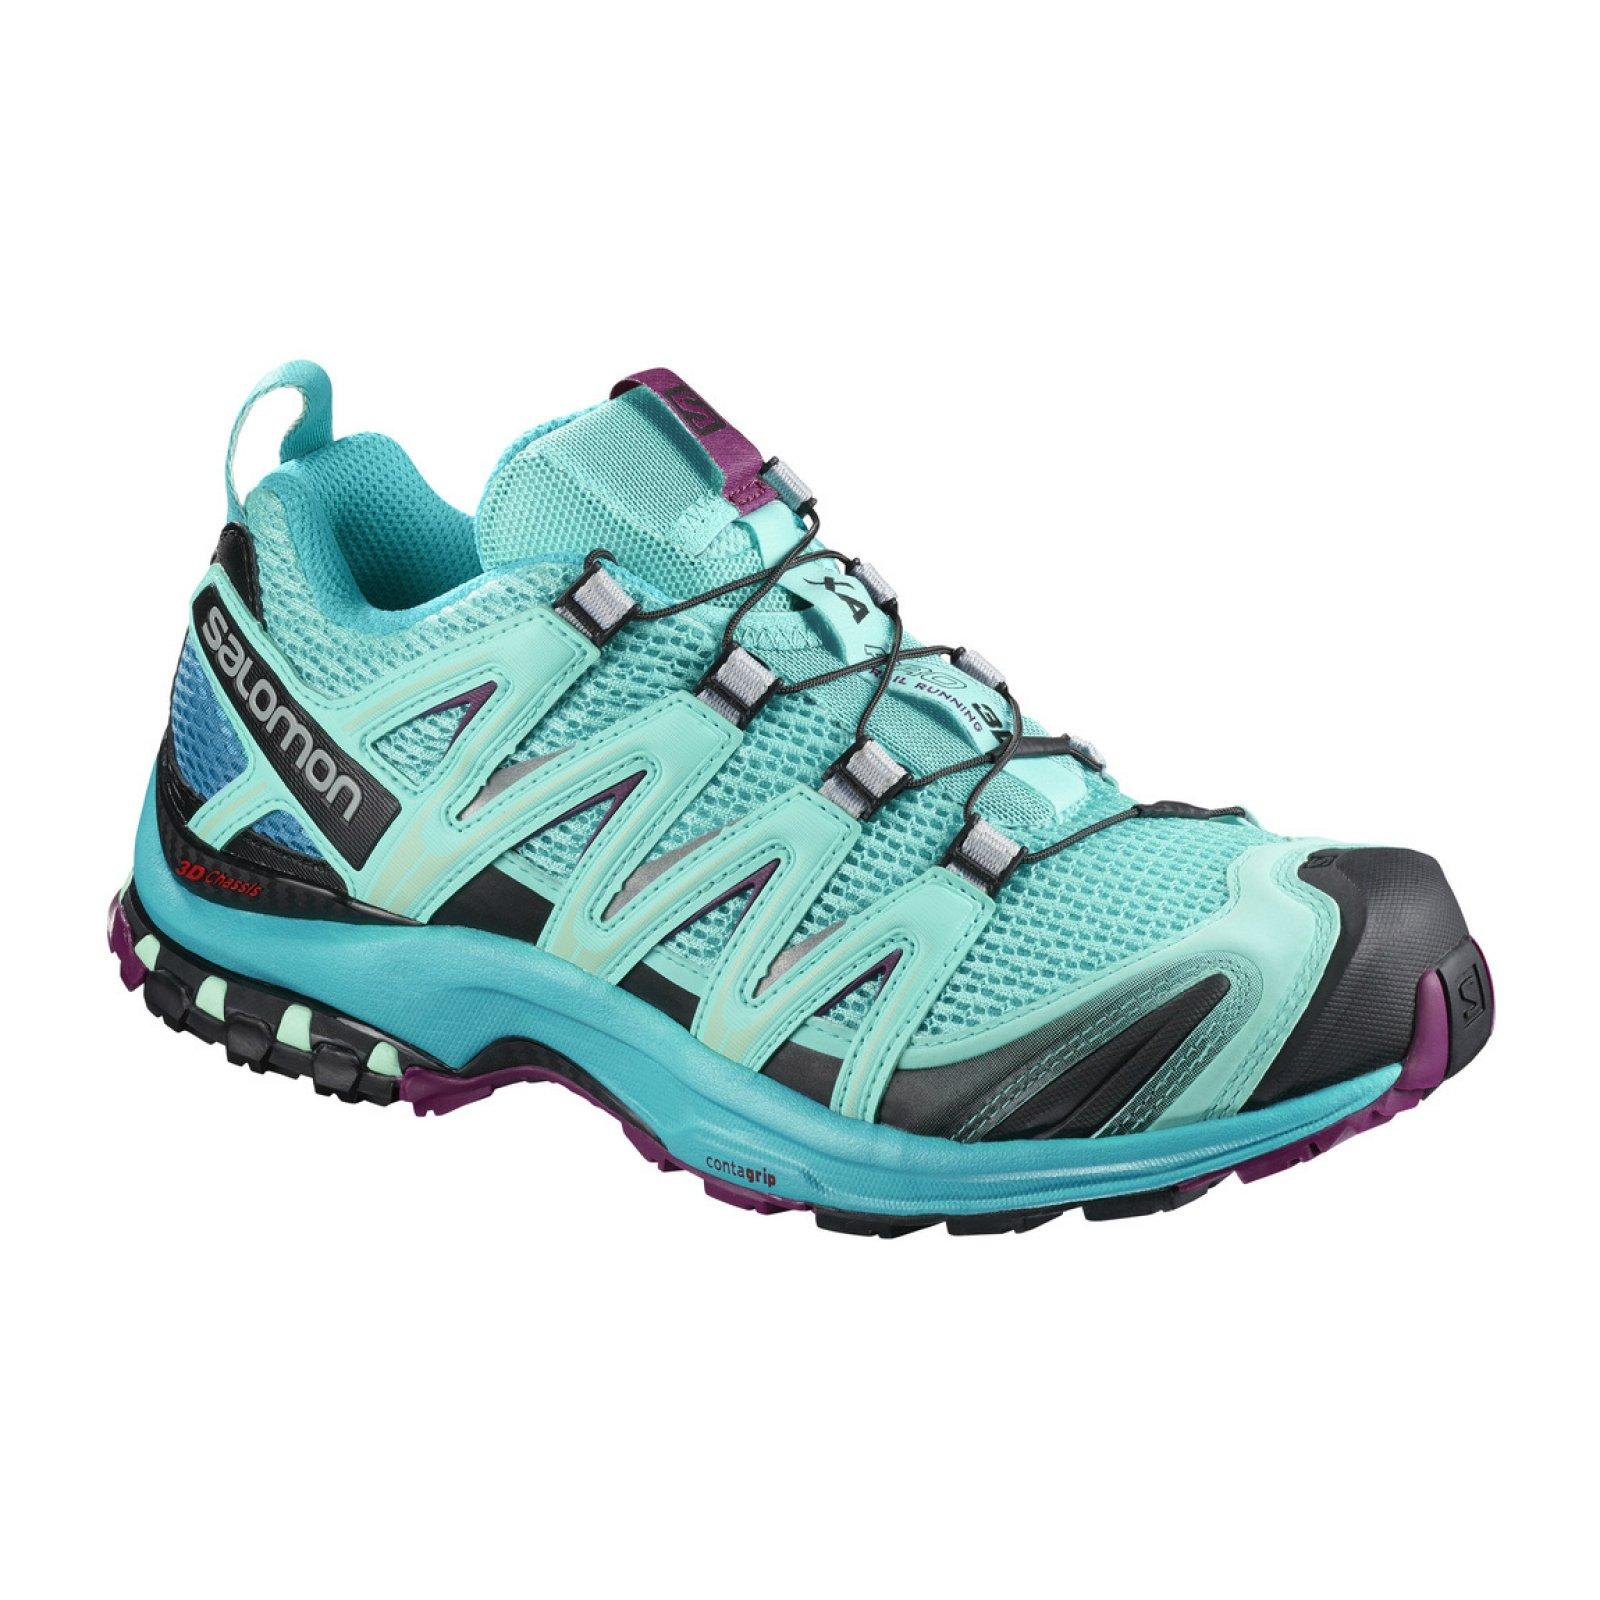 a001c71d5f3 Outdoorové boty Salomon XA Pro 3D W L40089600 - Actisport.cz